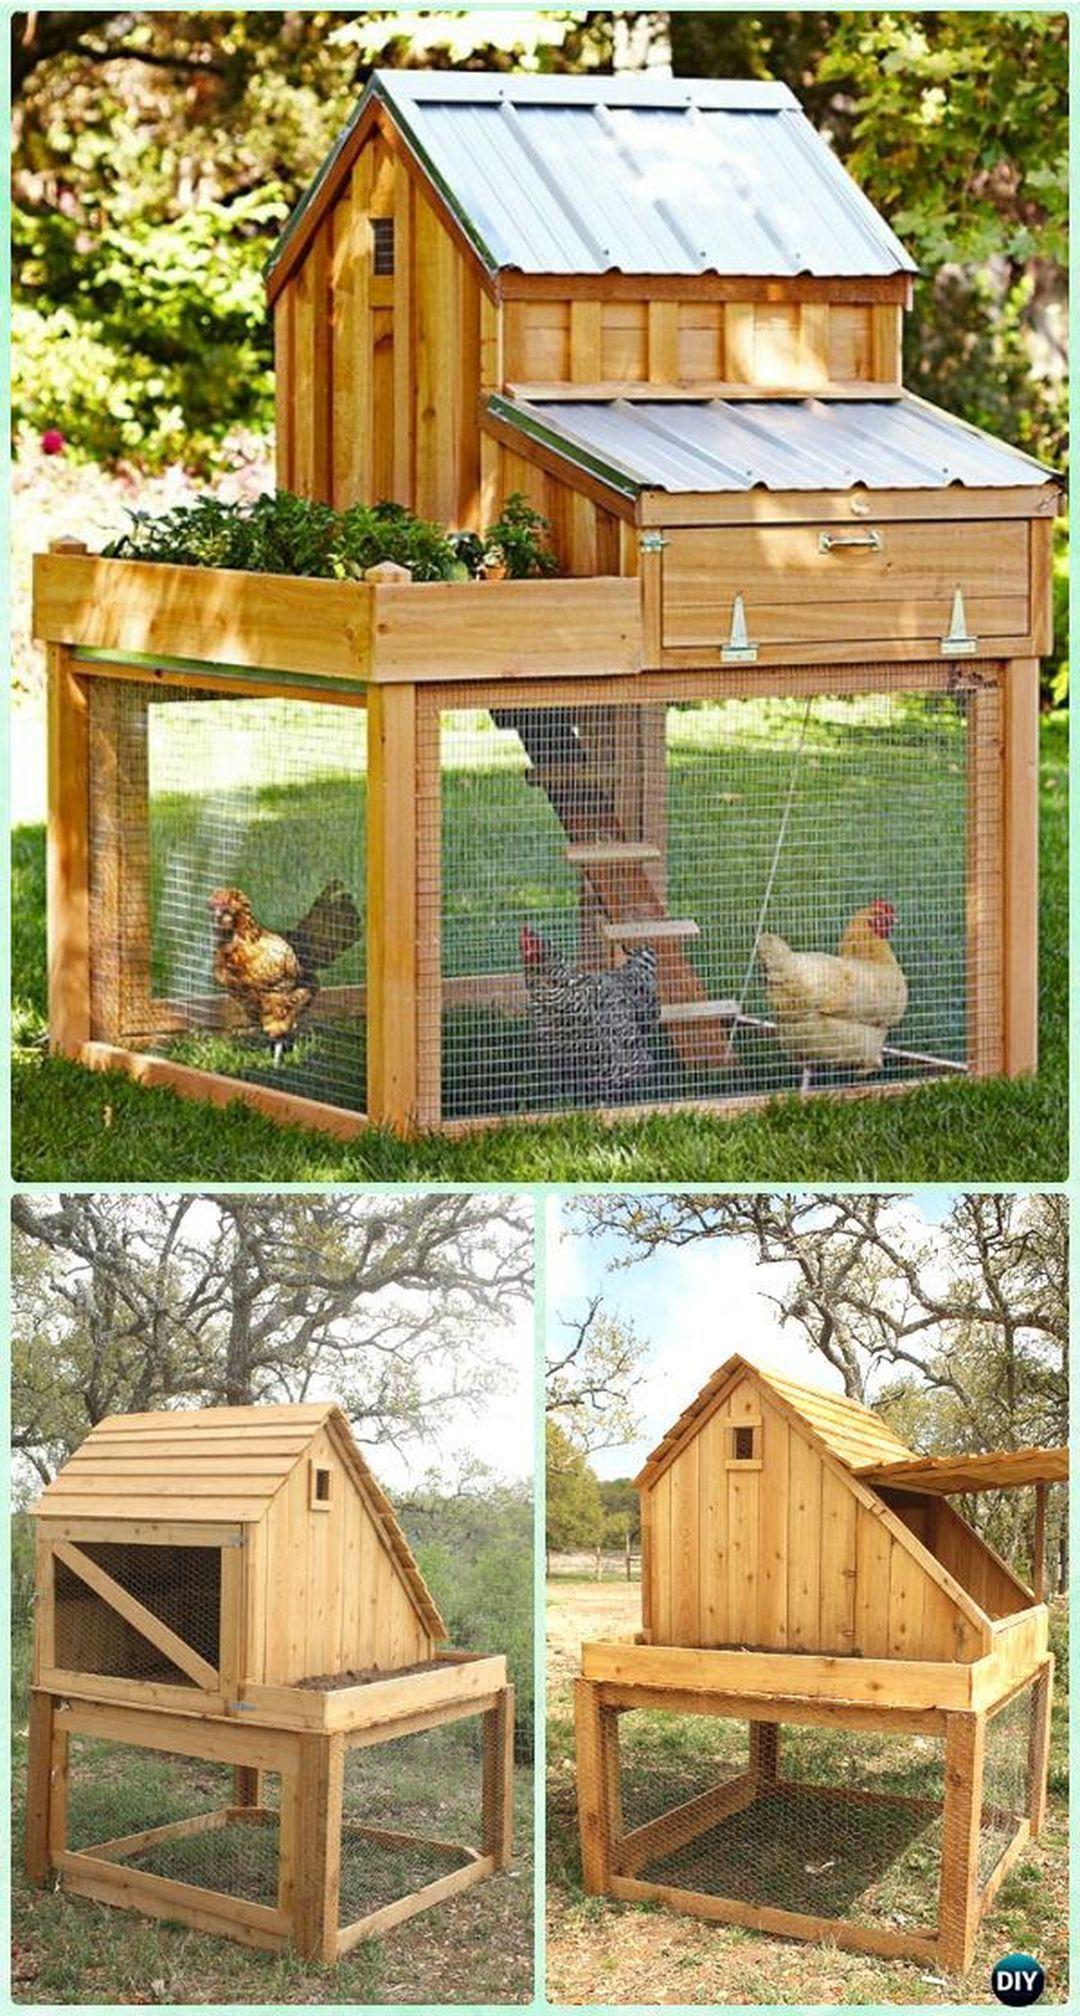 25 Attractive Low Budget Diy Chicken Coop Design Ideas In 2020